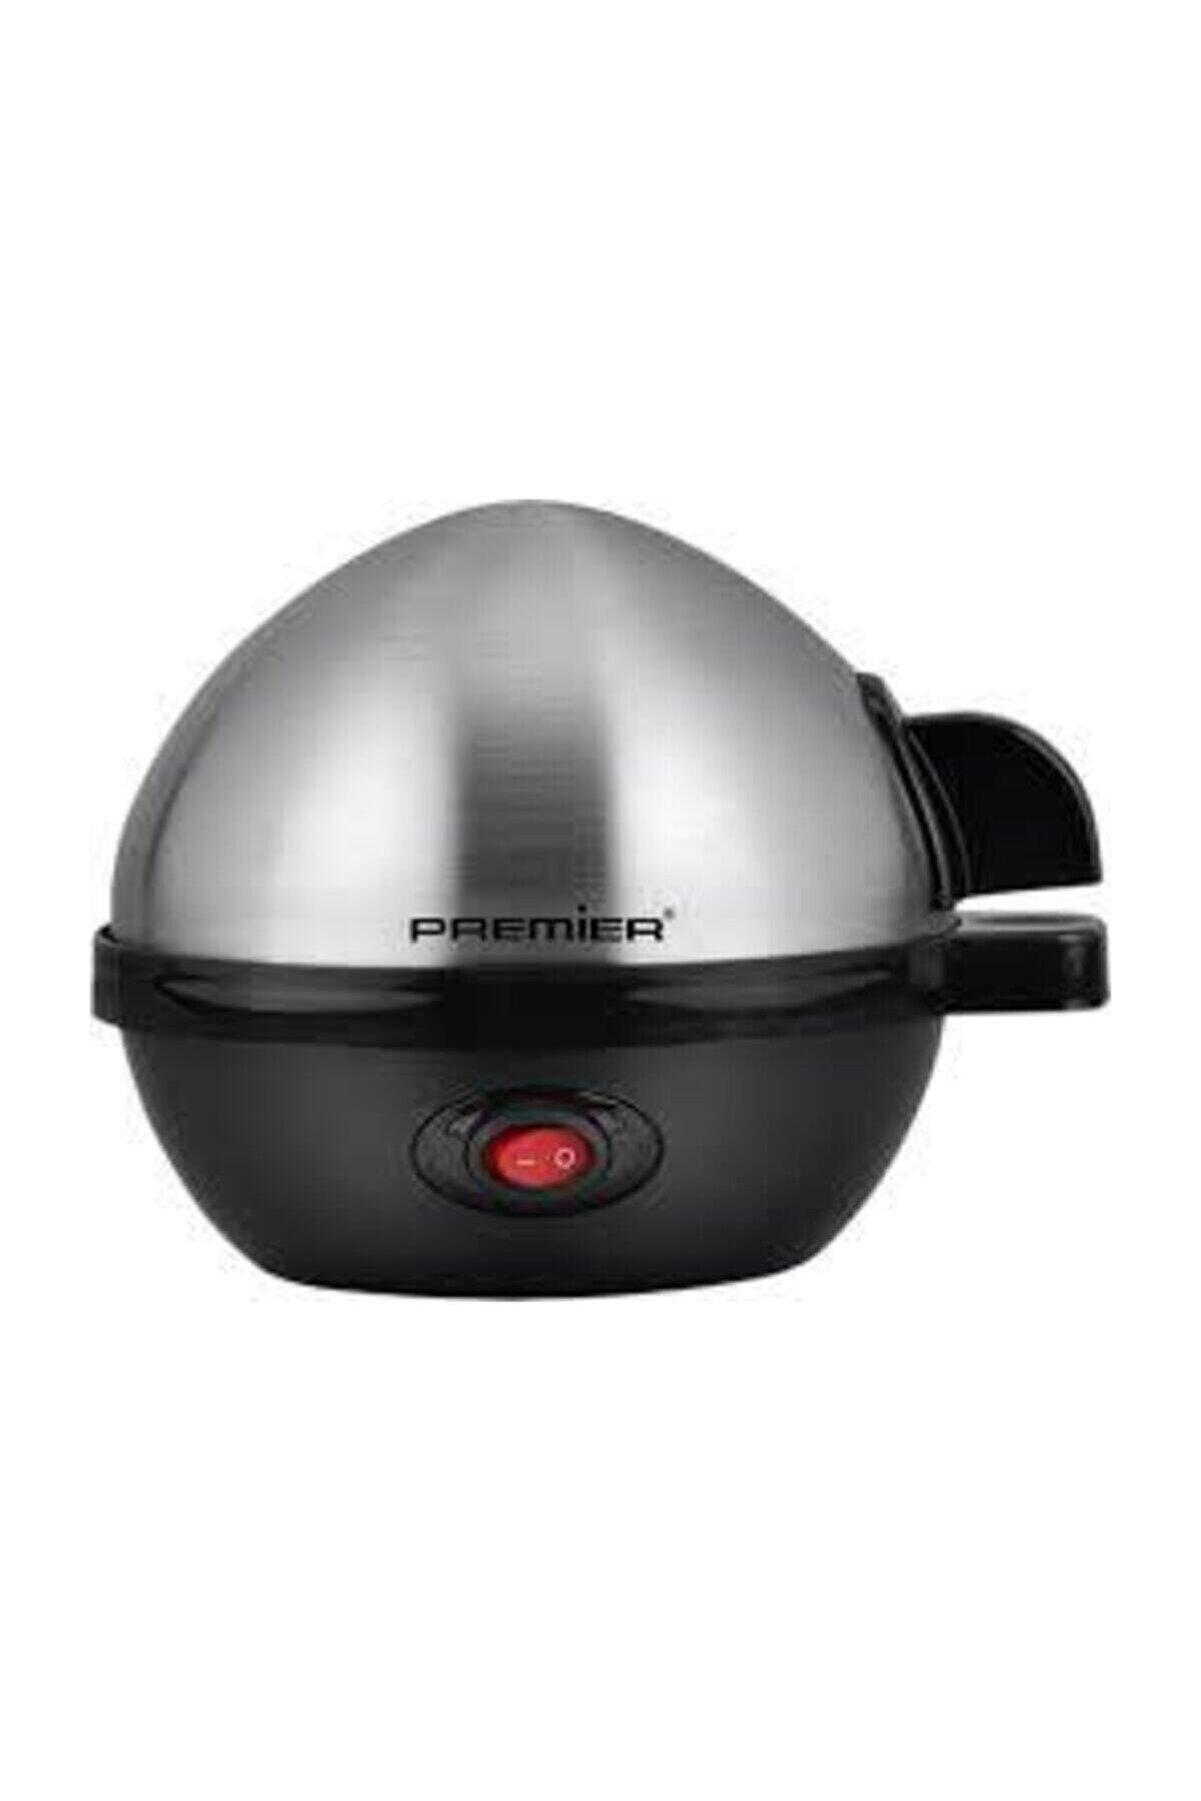 PREMIER J-150 7019 Yumurta Pişirme Makinesi